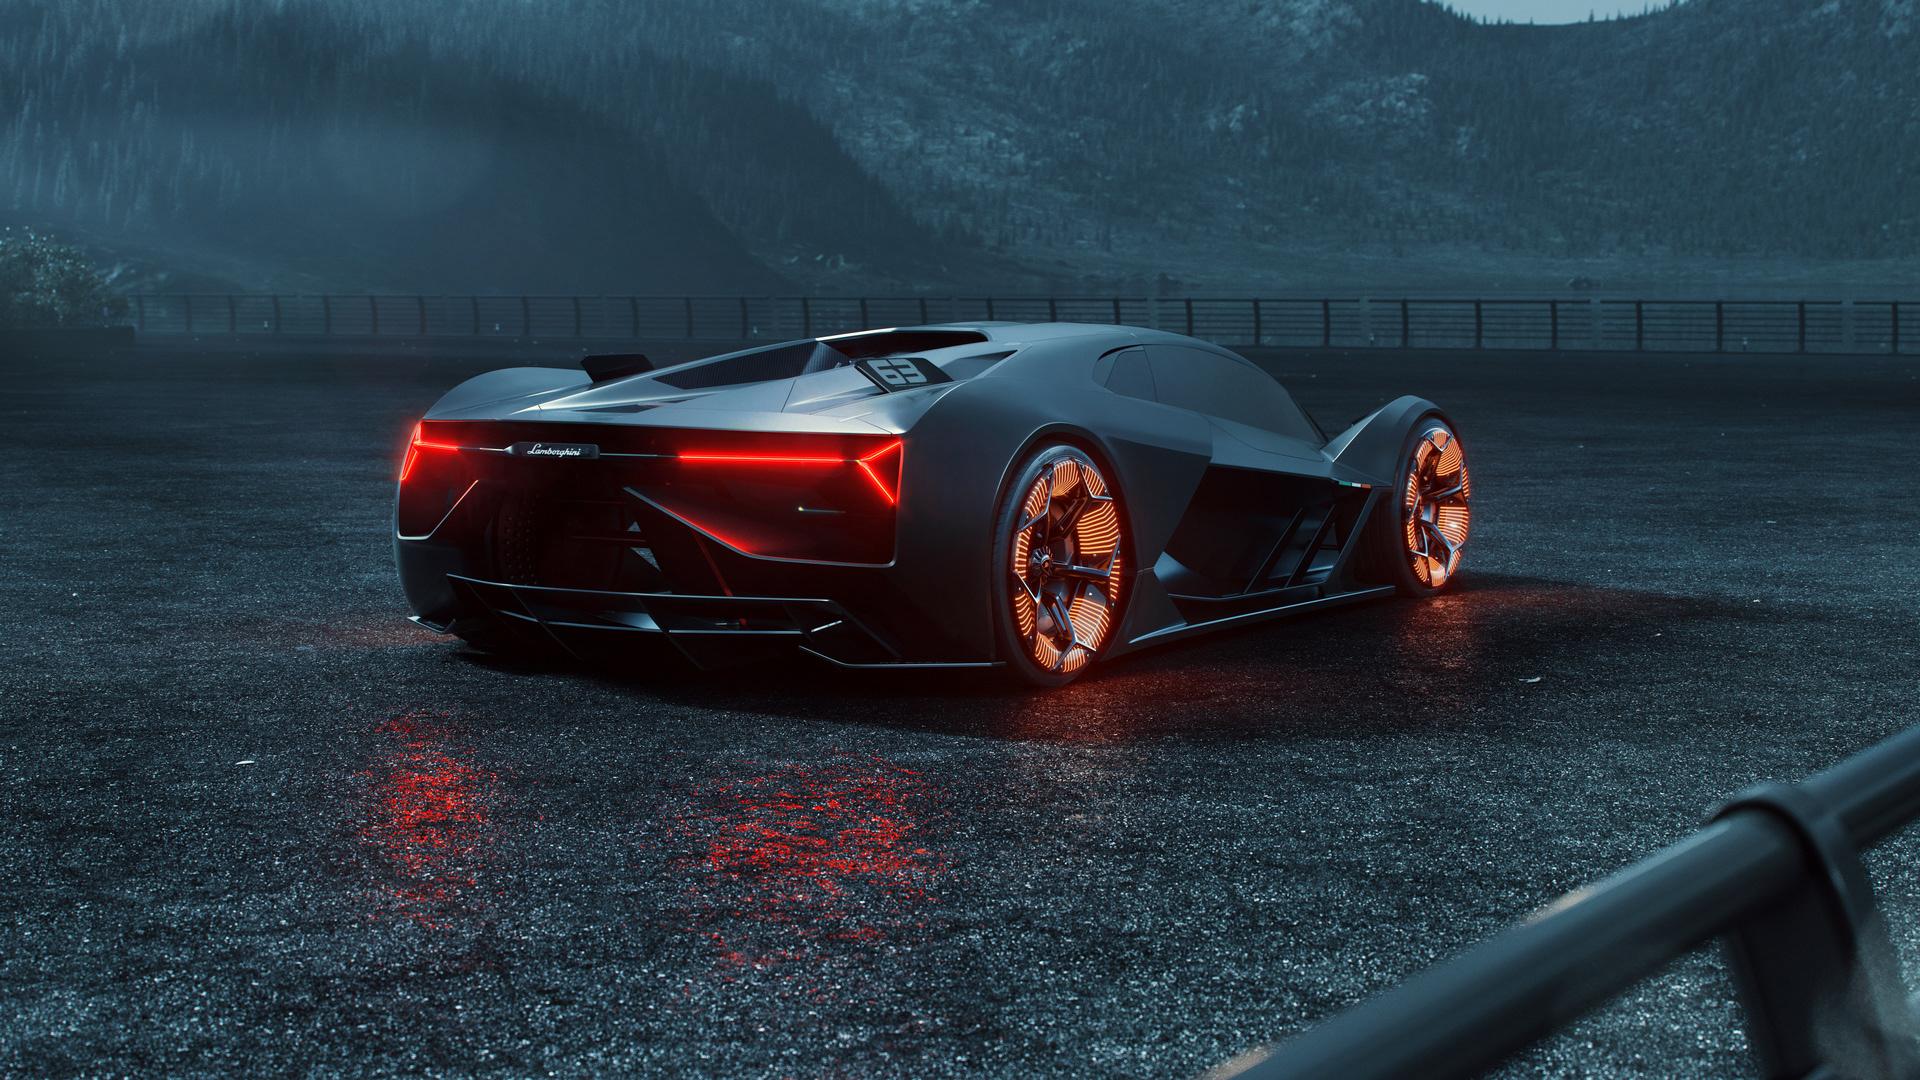 Car Mobile Wallpaper: 2019 Lamborghini Terzo Millennio HD, HD Cars, 4k